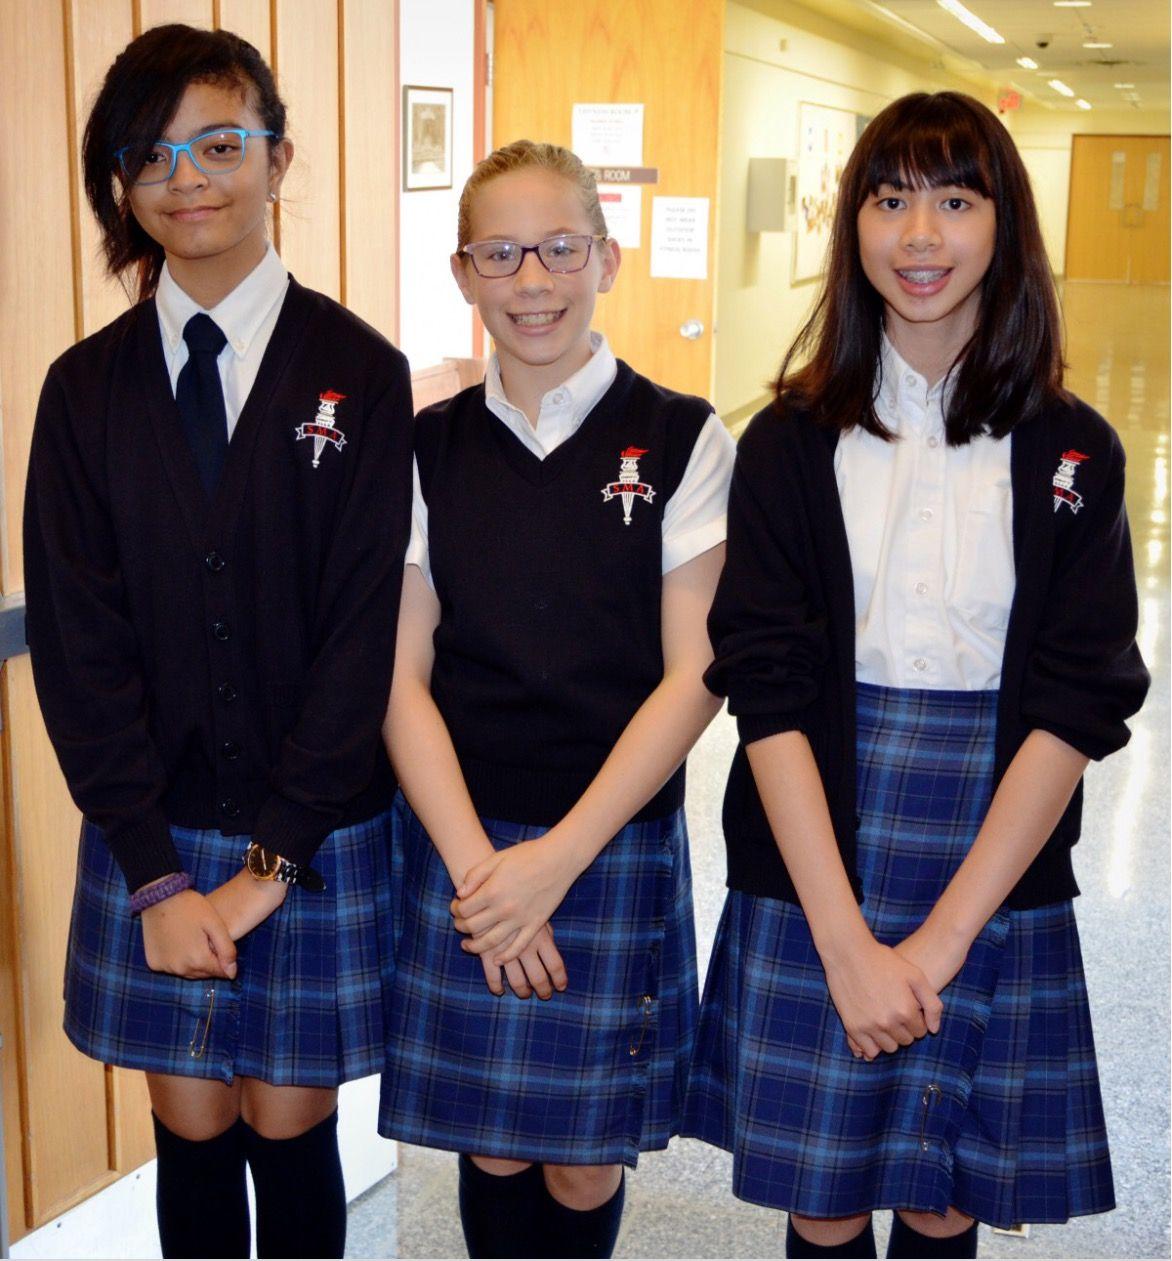 Pin by dawn on school girls pinterest girls